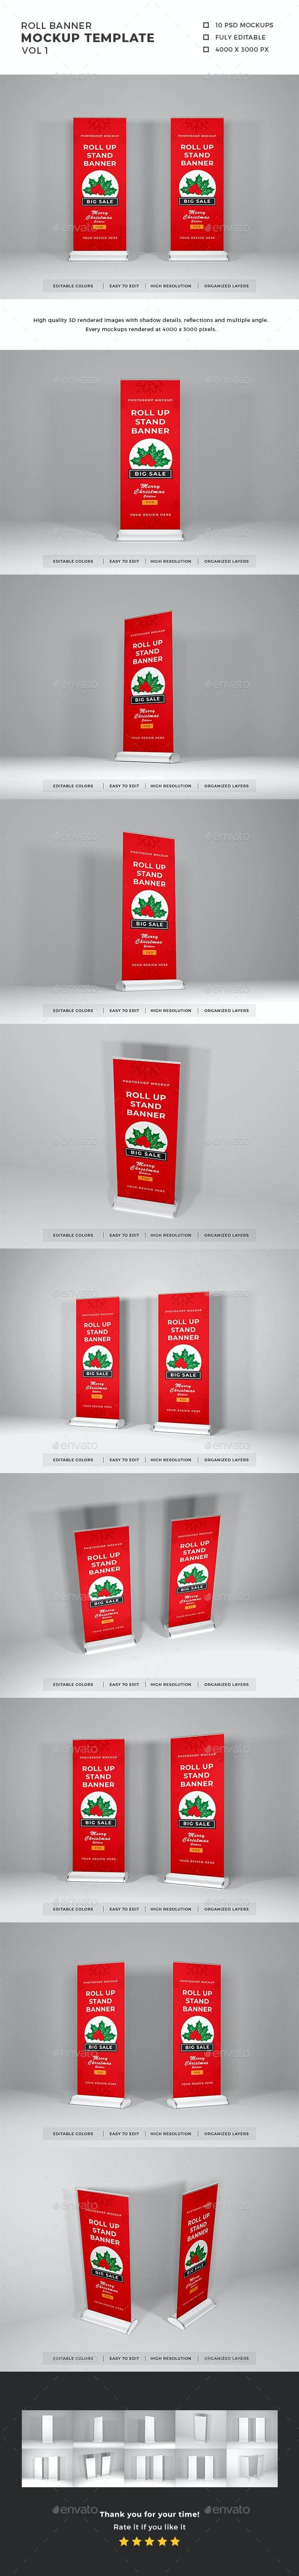 Roll Banner Mockup Template Vol 1 - Print Product Mock-Ups